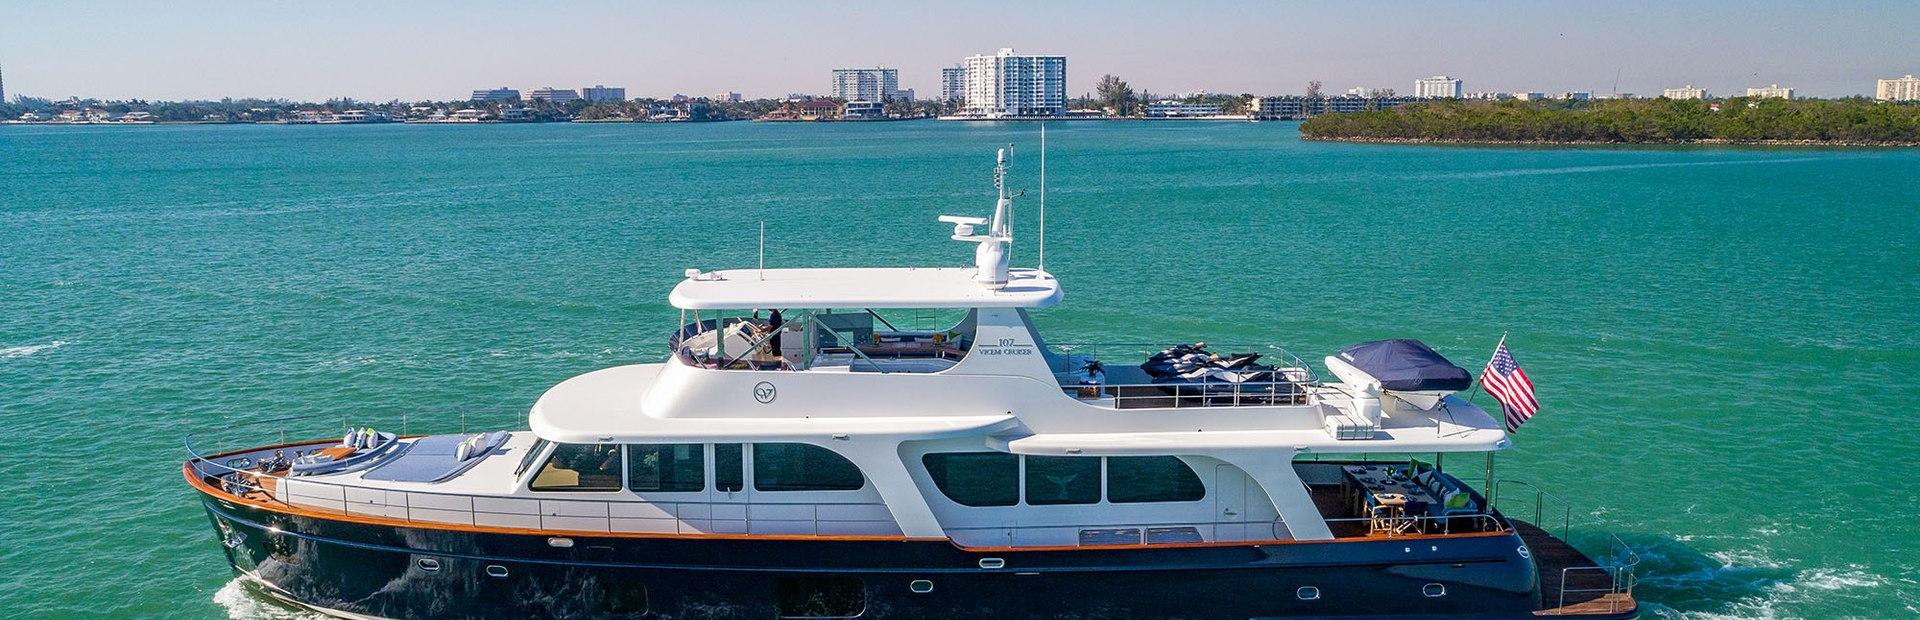 Vicem Cruiser 107 Yacht Charter